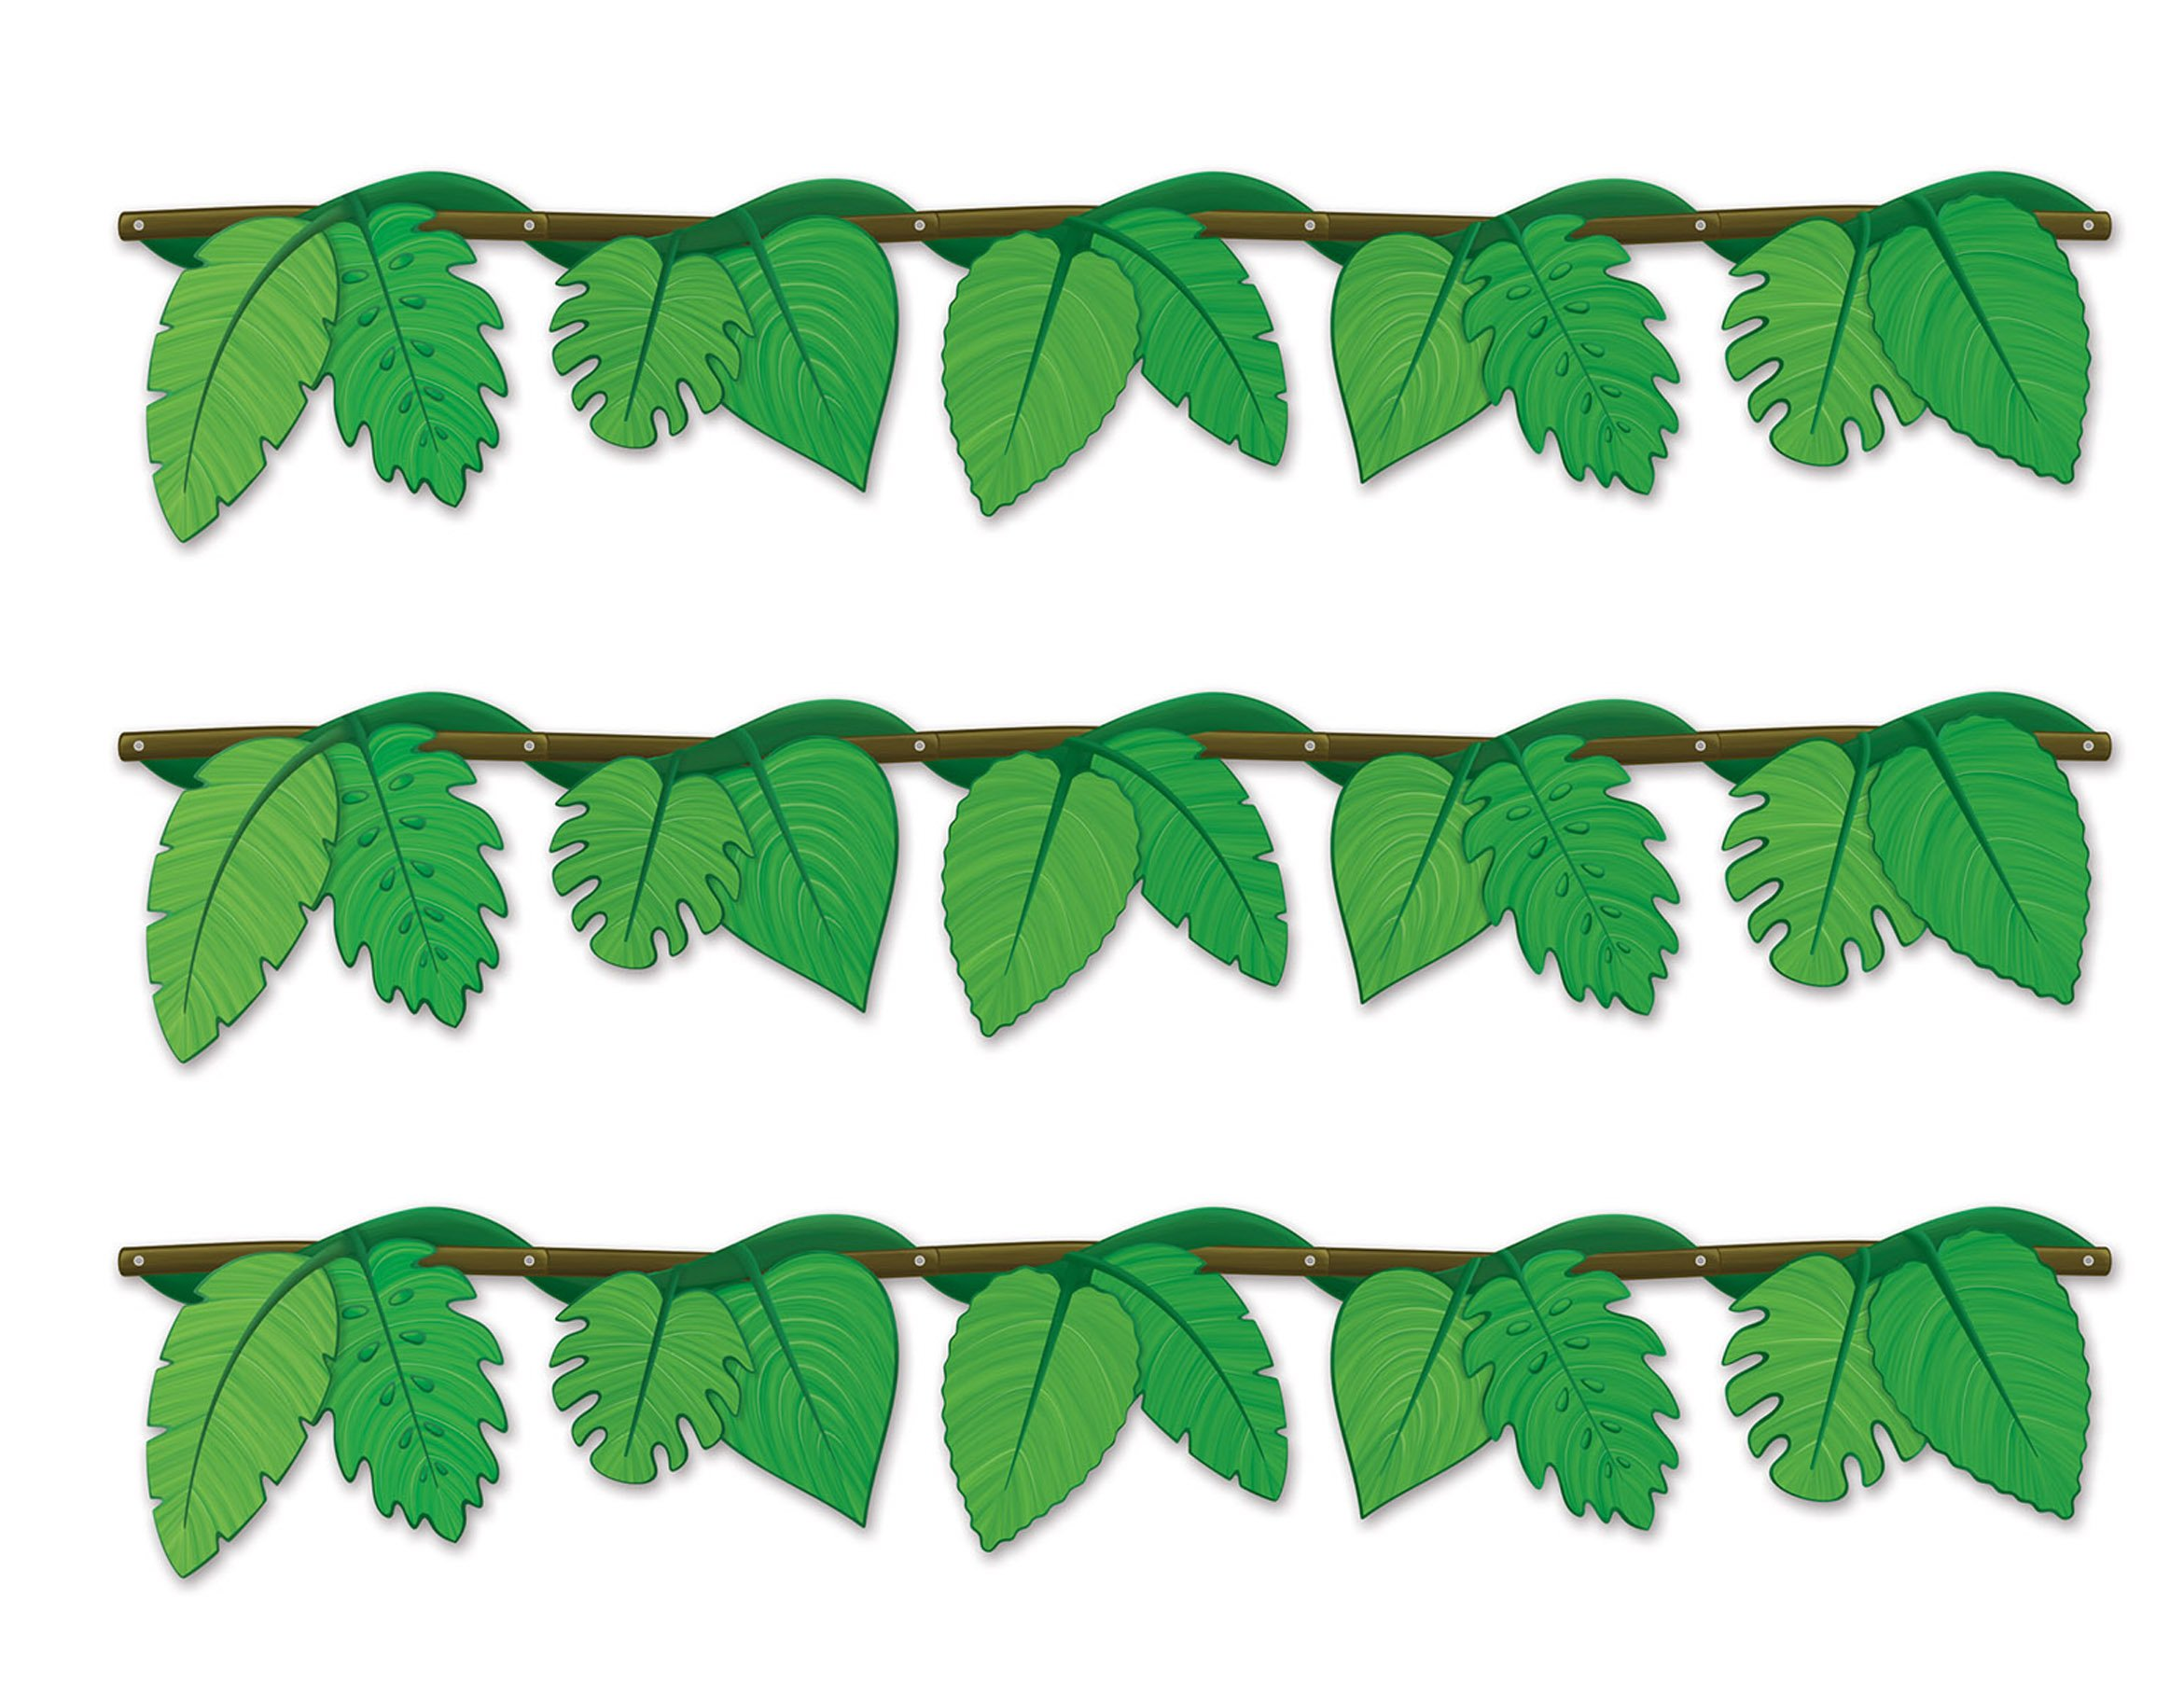 Beistle S54921AZ3, 3 Piece Jungle Vine Streamers, 48.5''